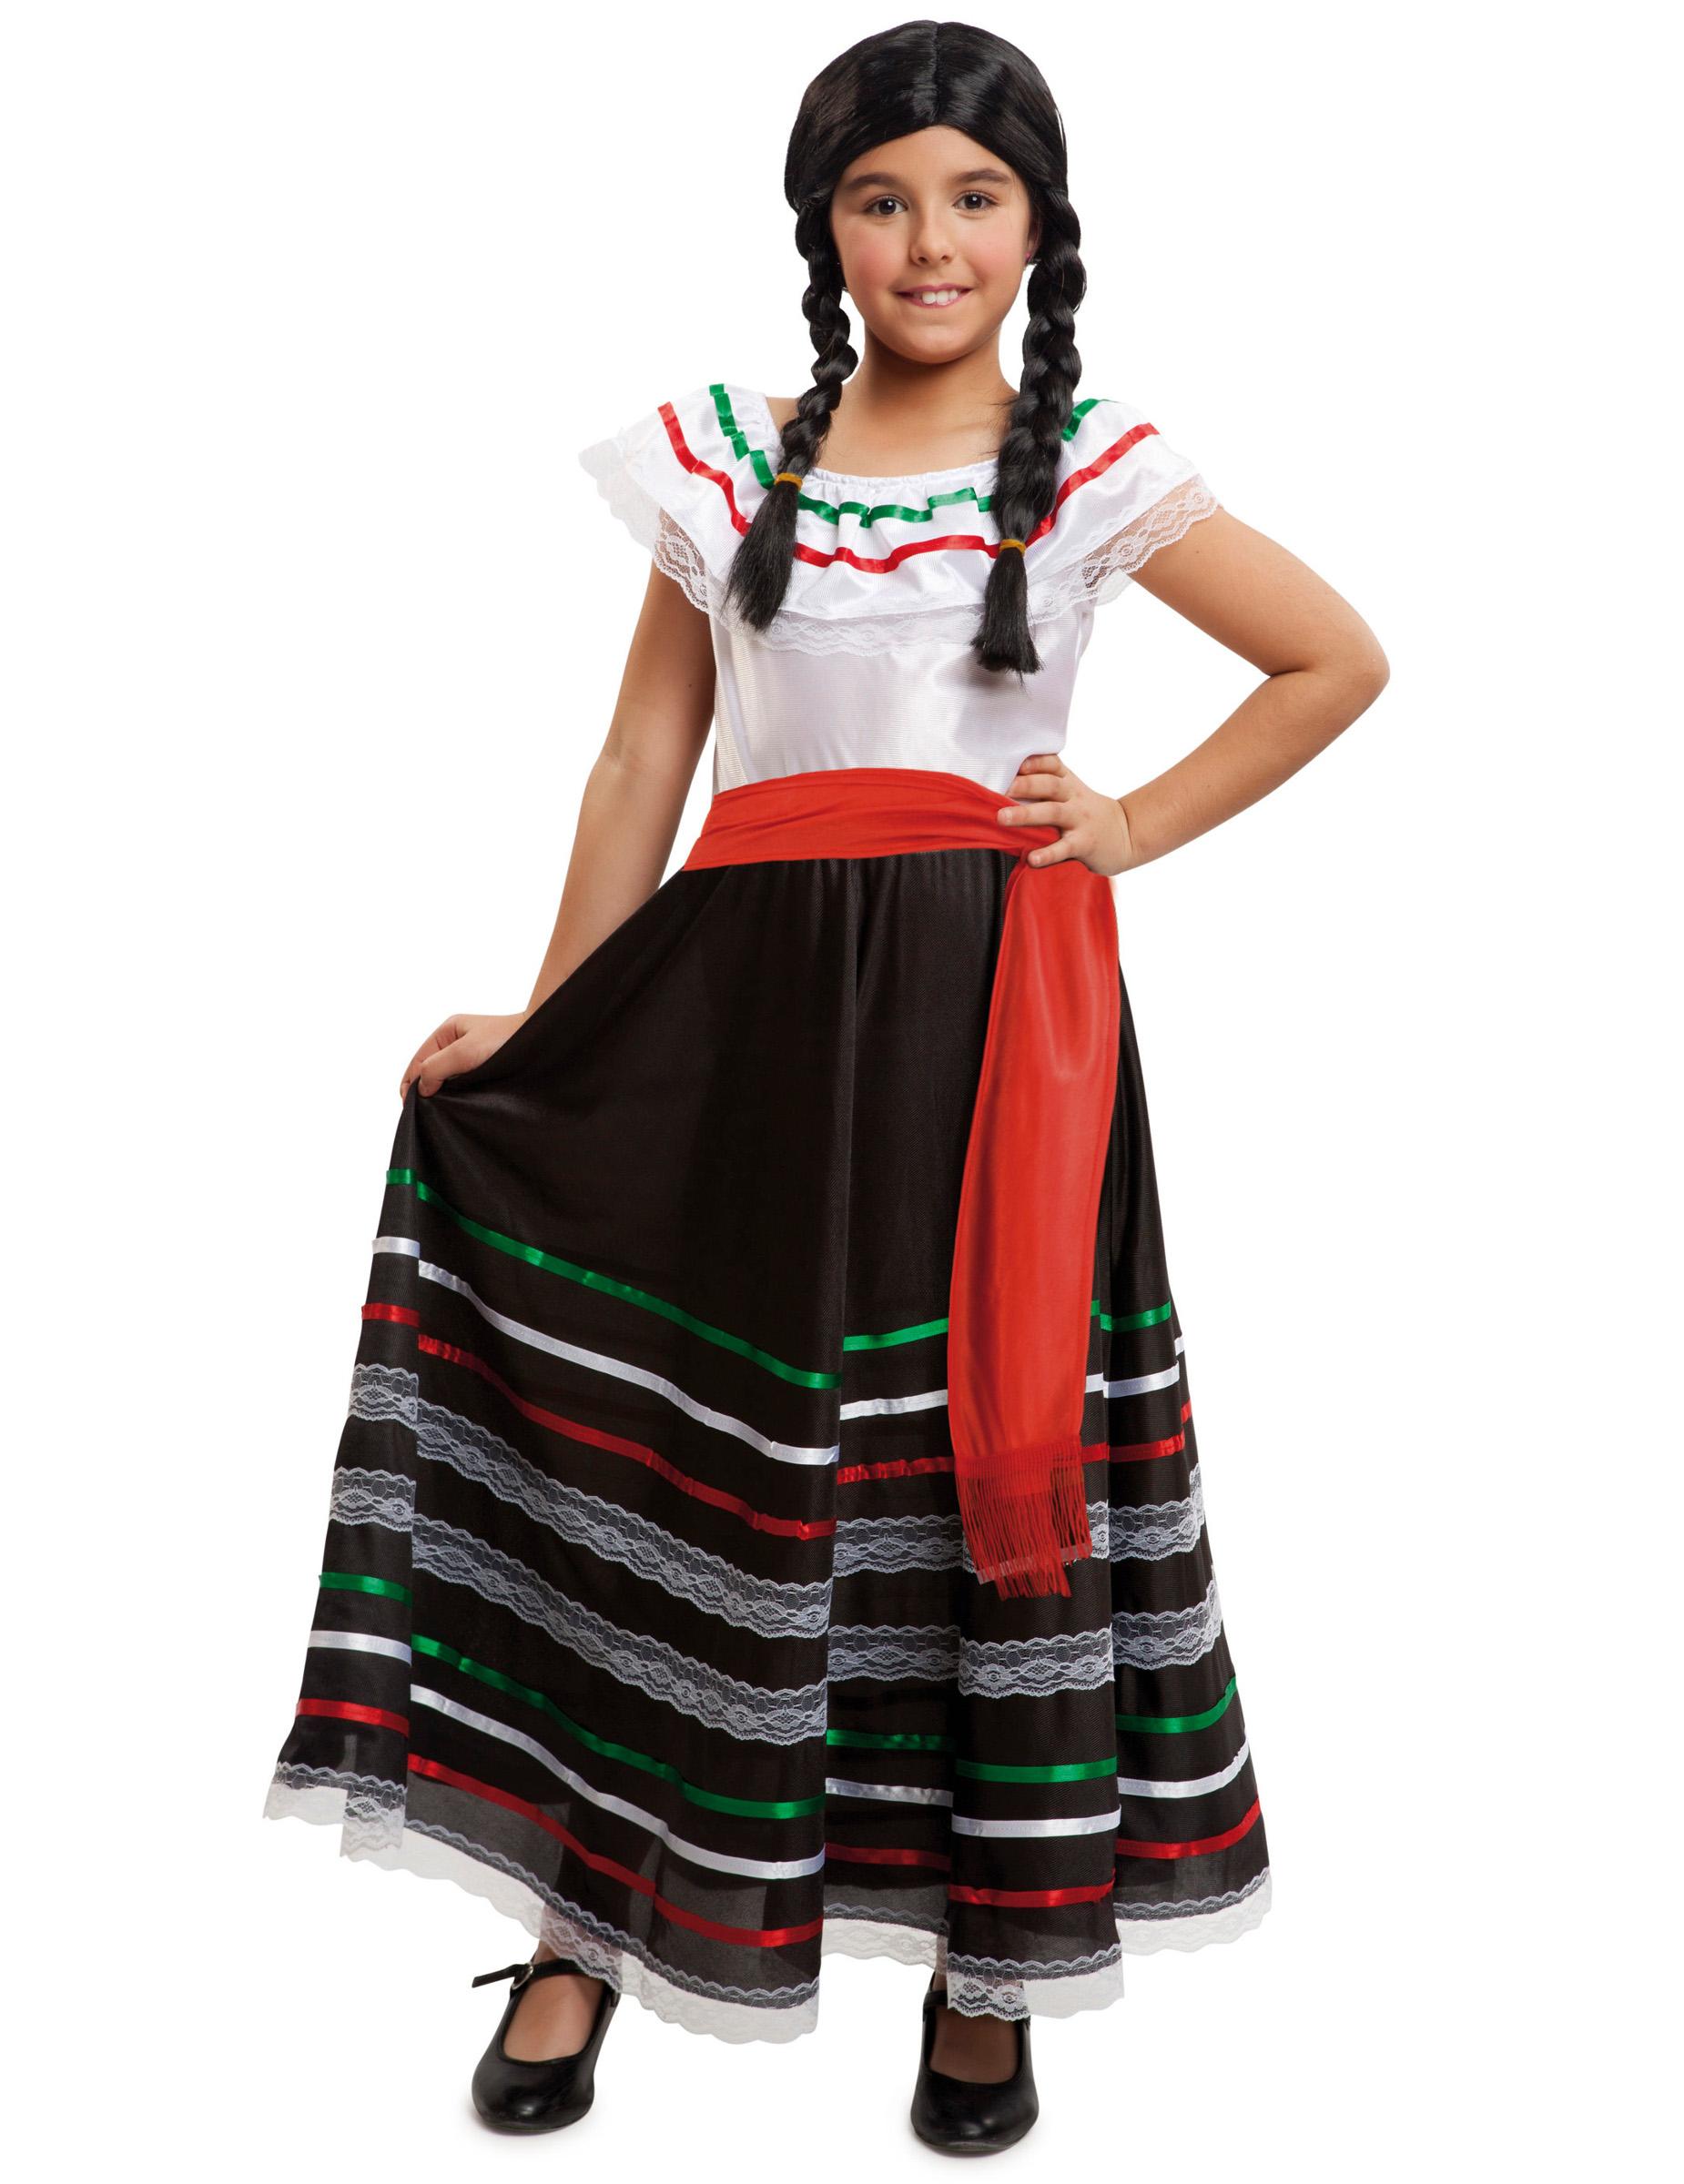 Honduras mujer de noche - 3 part 6